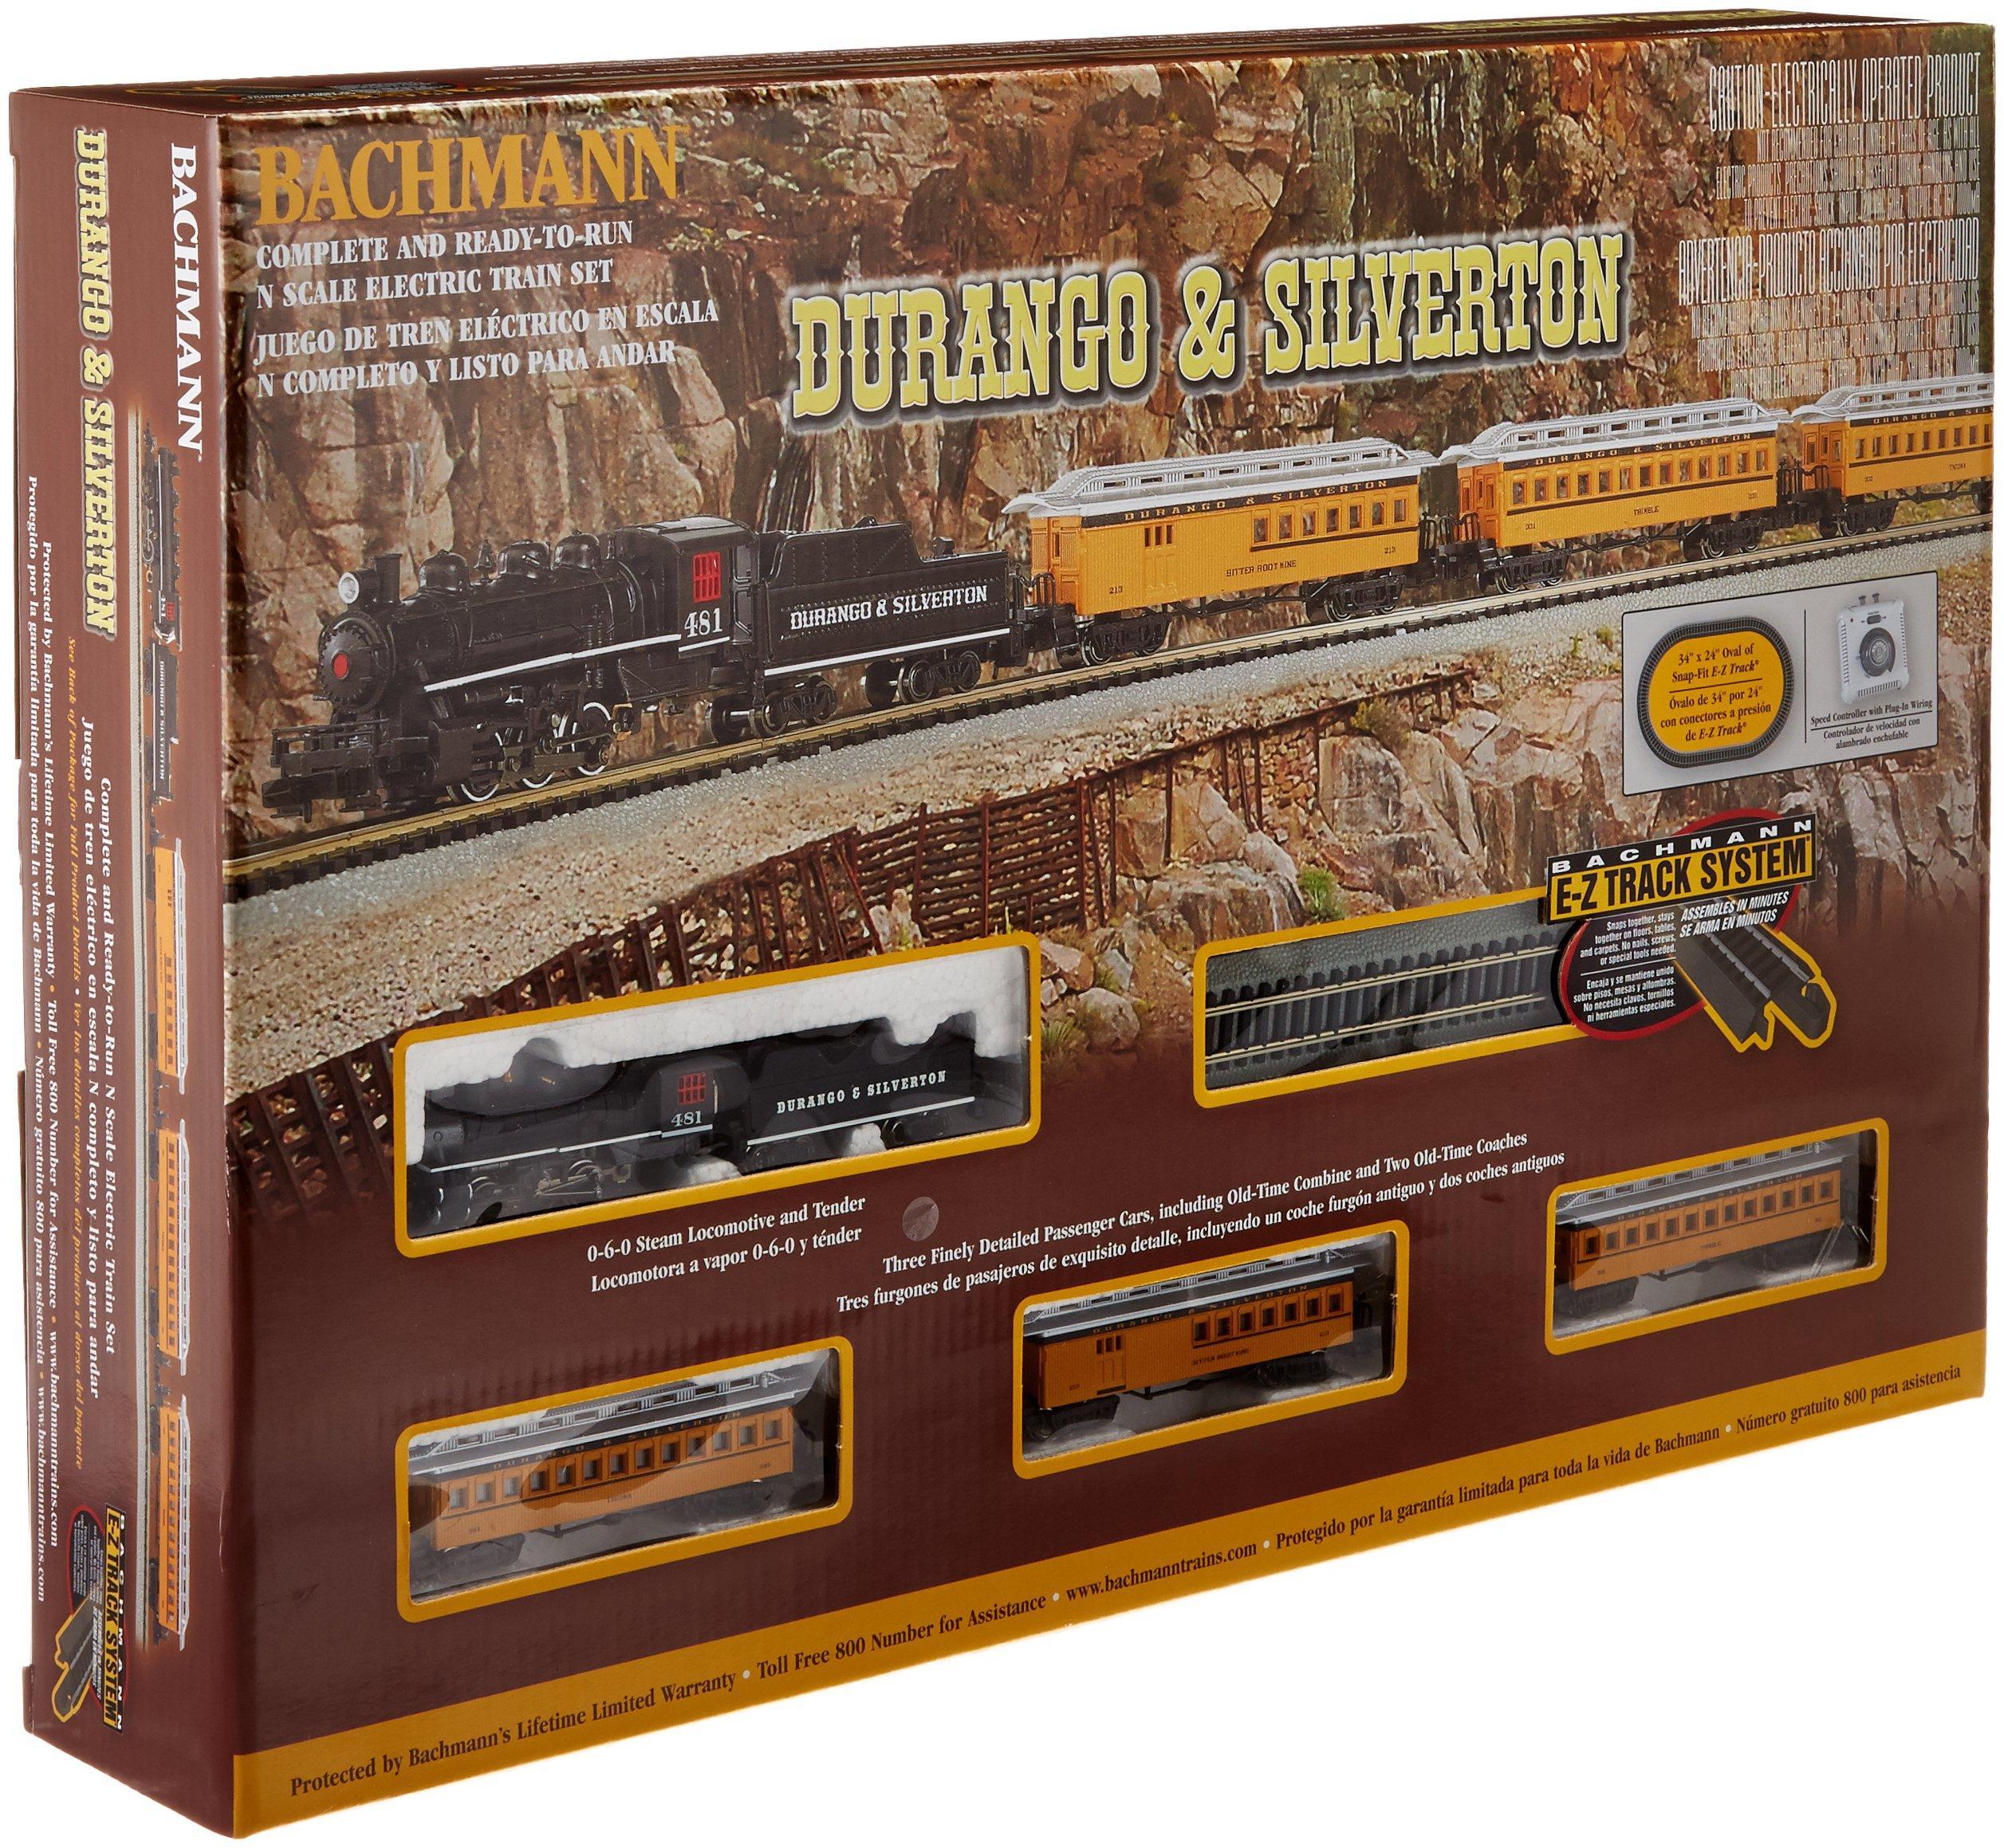 Bachmann Industries Durango and Silverton - N Scale Ready to Run Electric Train Set – Designed for Advanced Train Enthusiast